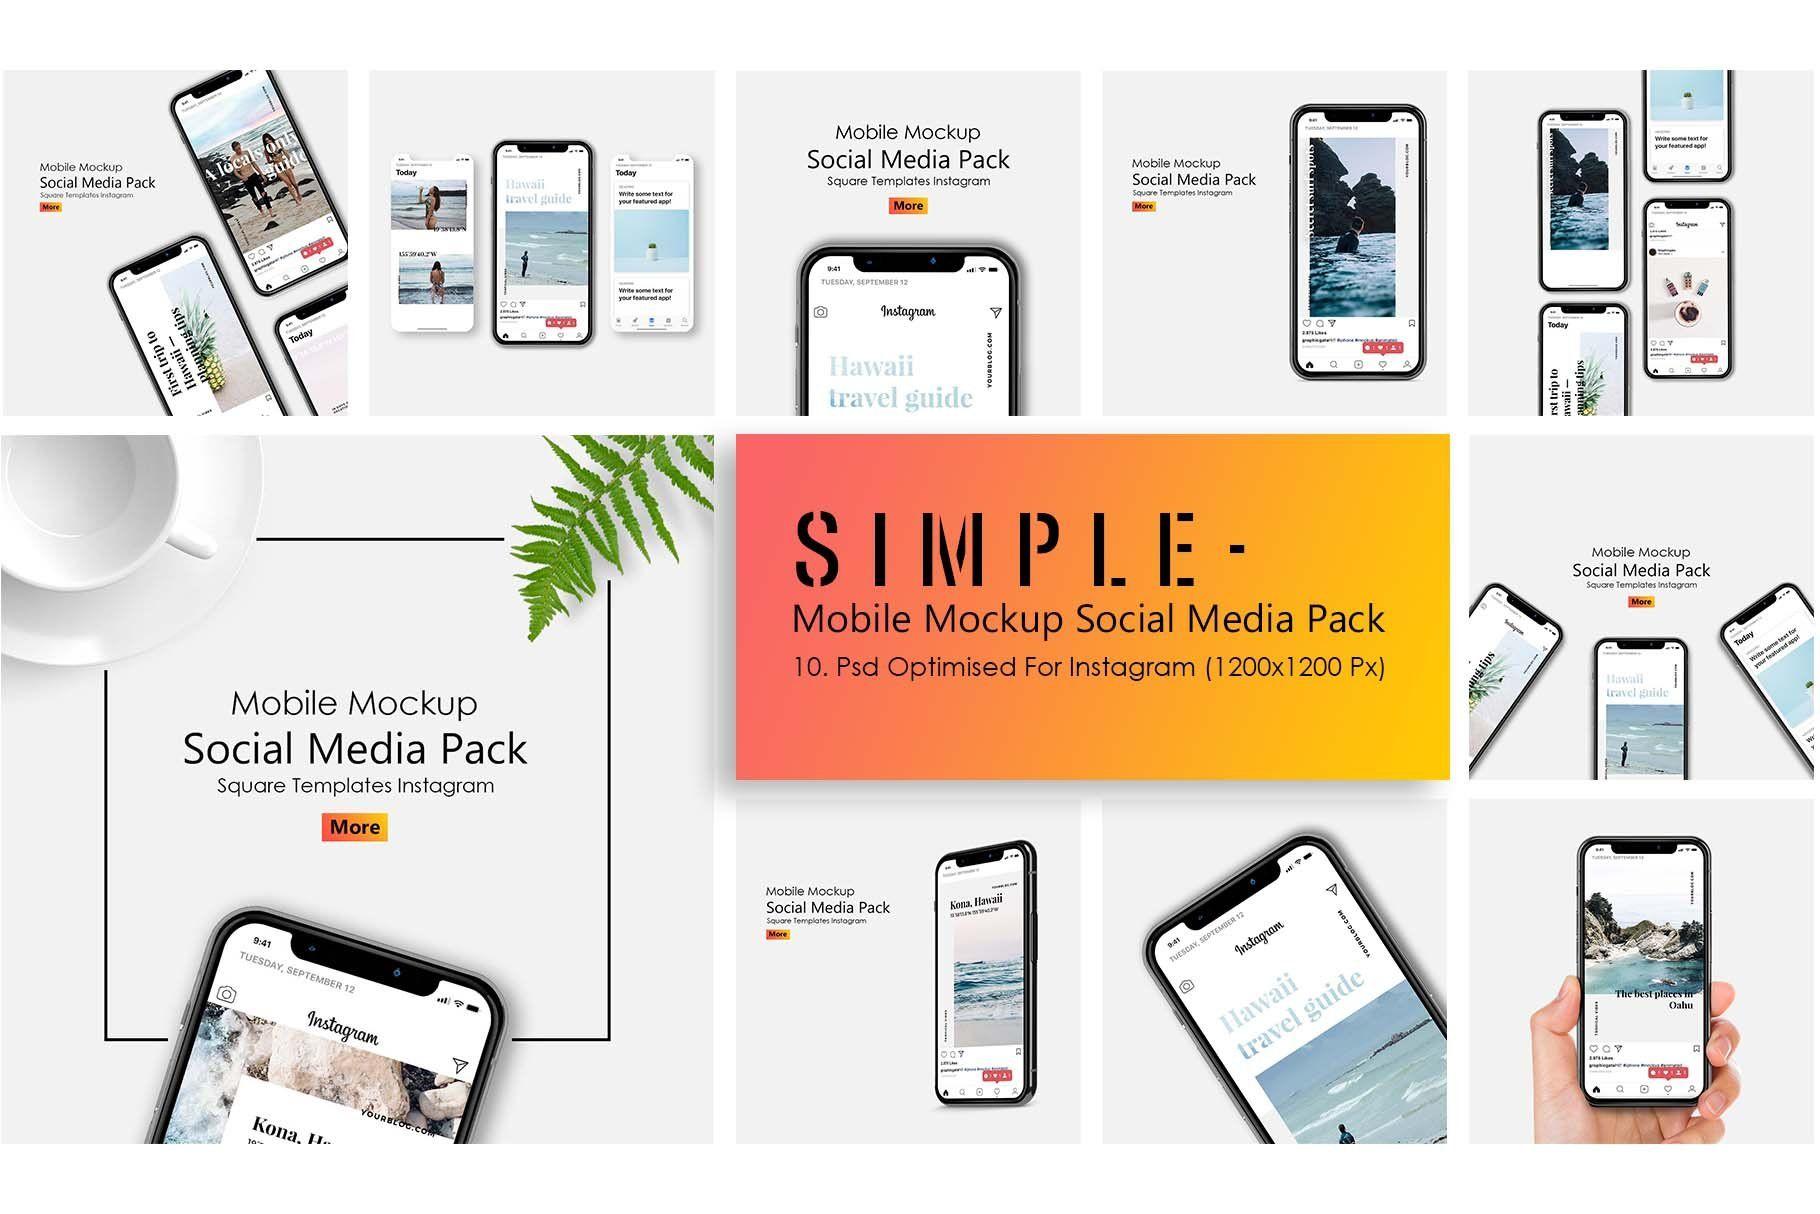 Iphone X Mockup Social Media Pack Social Media Pack Instagram Mobile Social Media